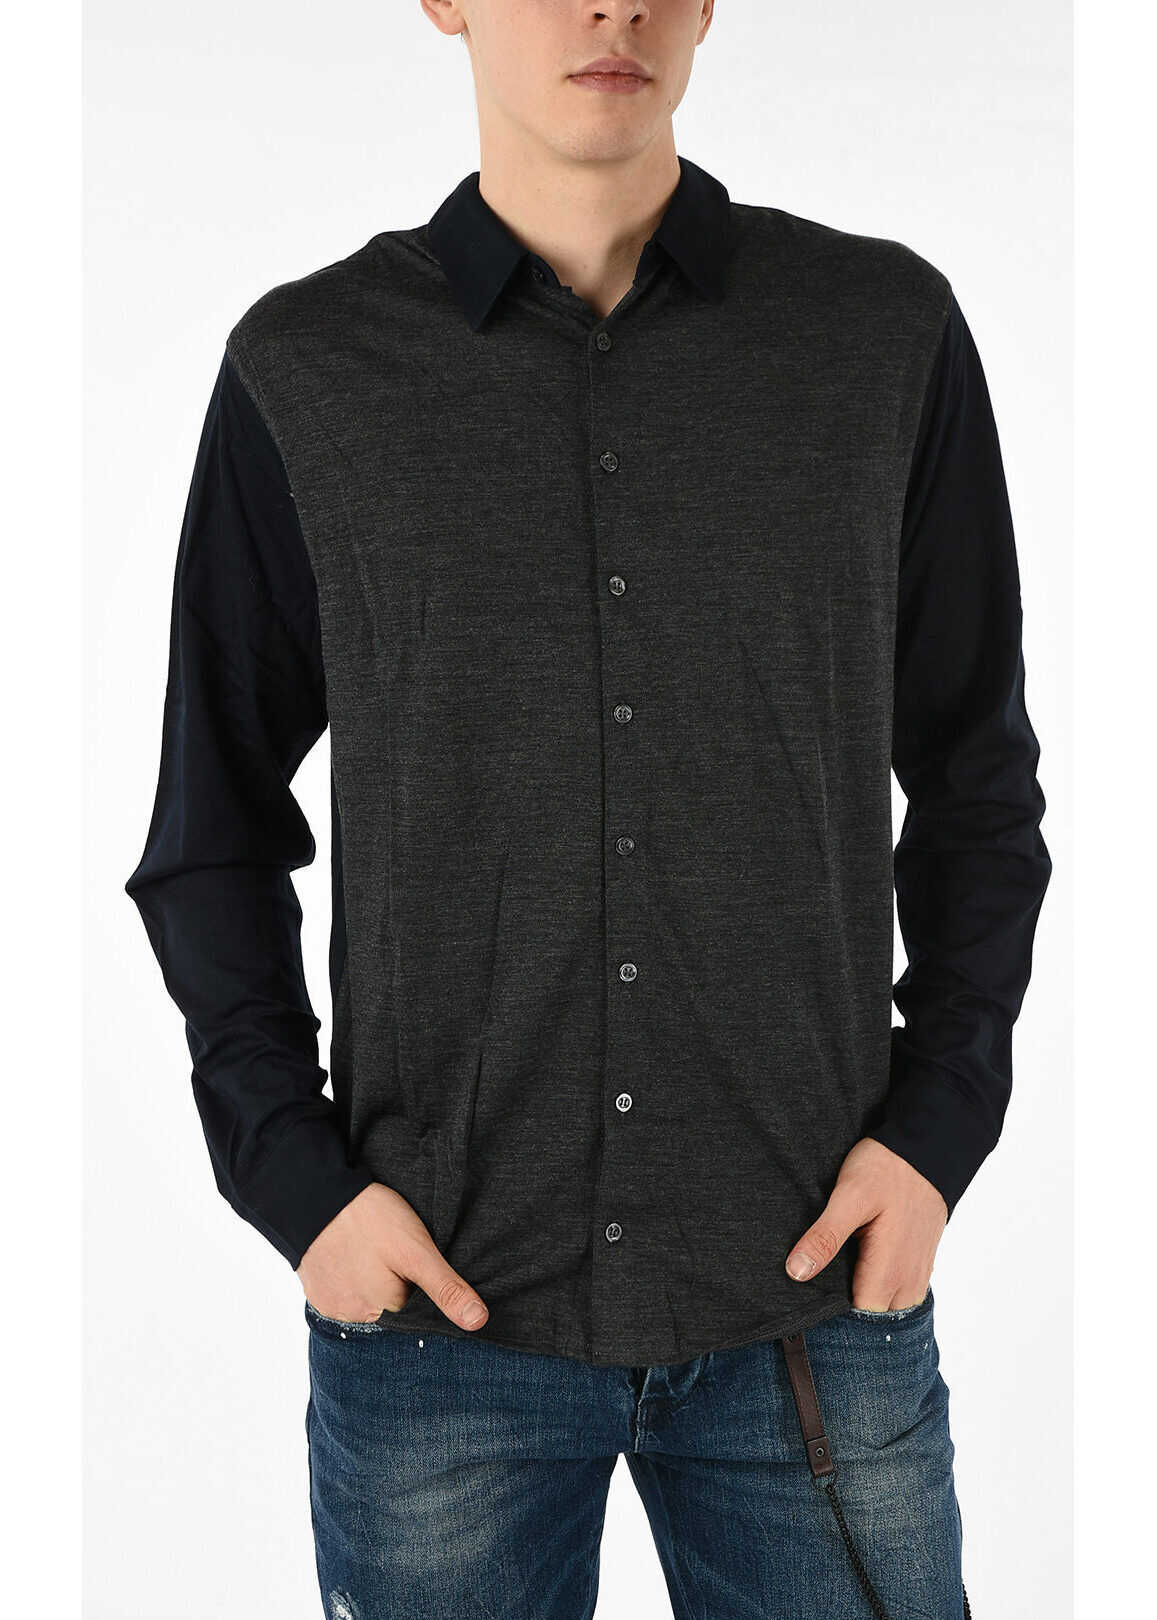 Armani EMPORIO Knitted Shirt MULTICOLOR